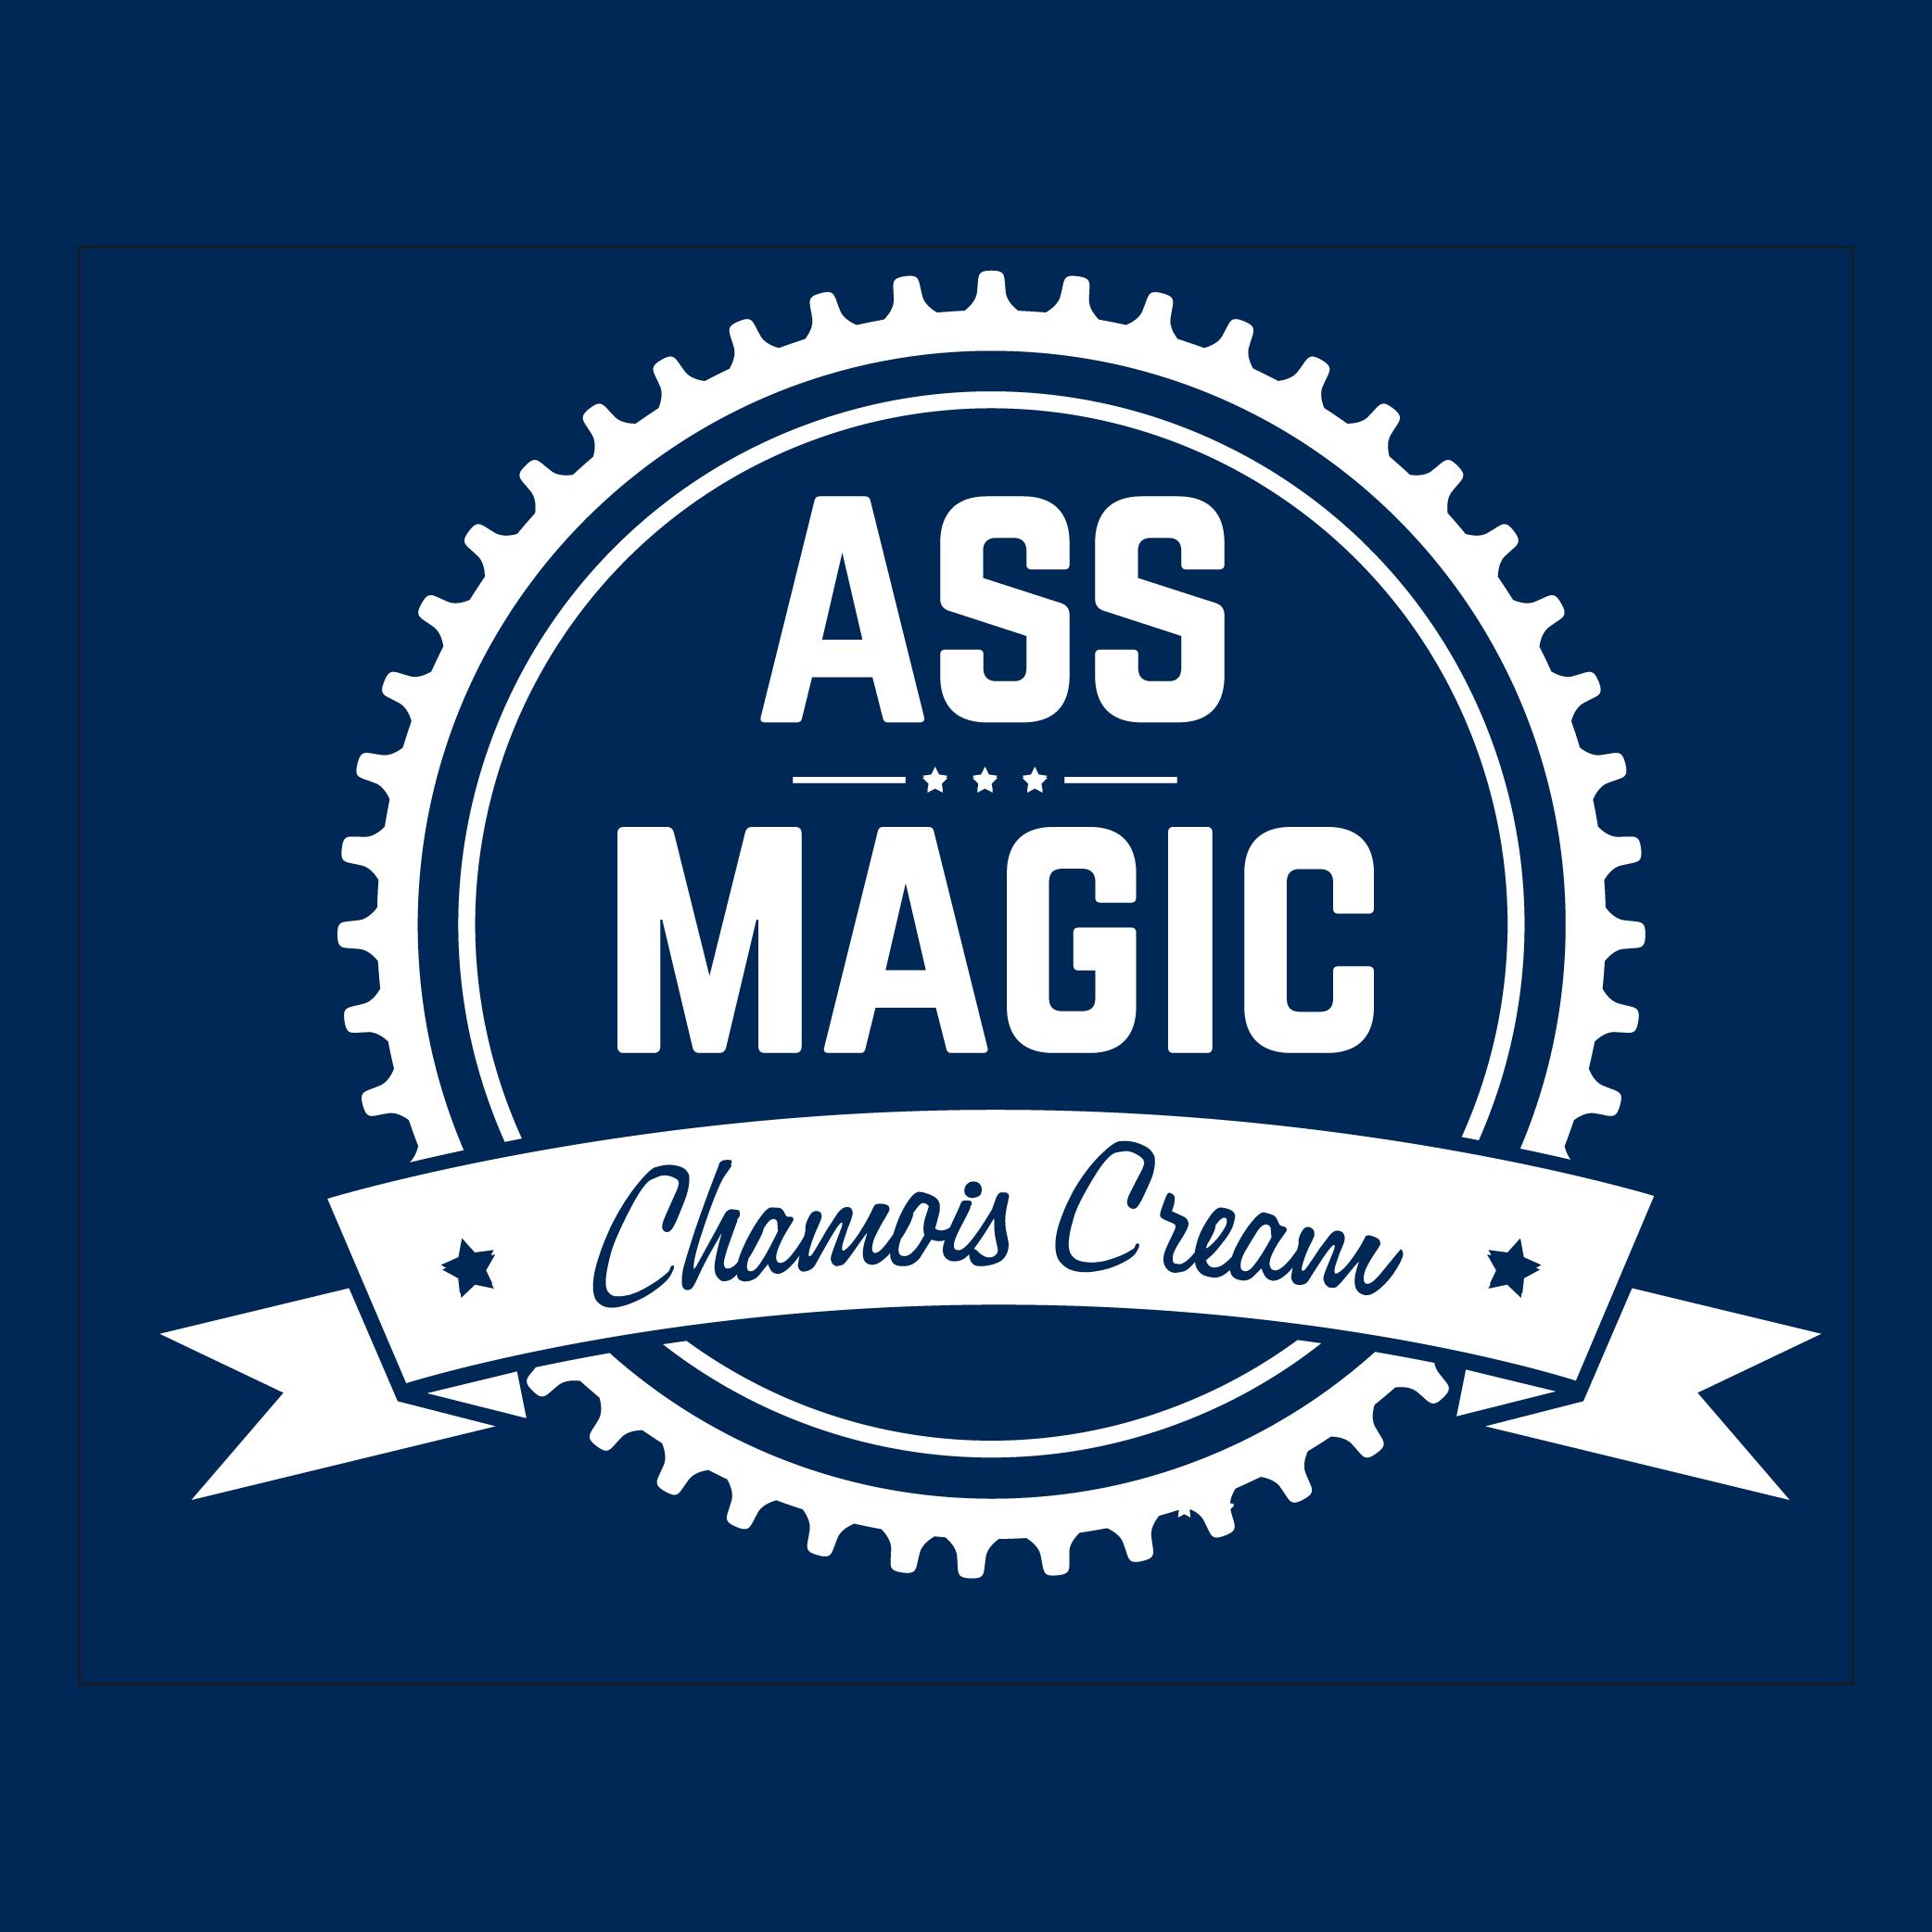 Ass Magic